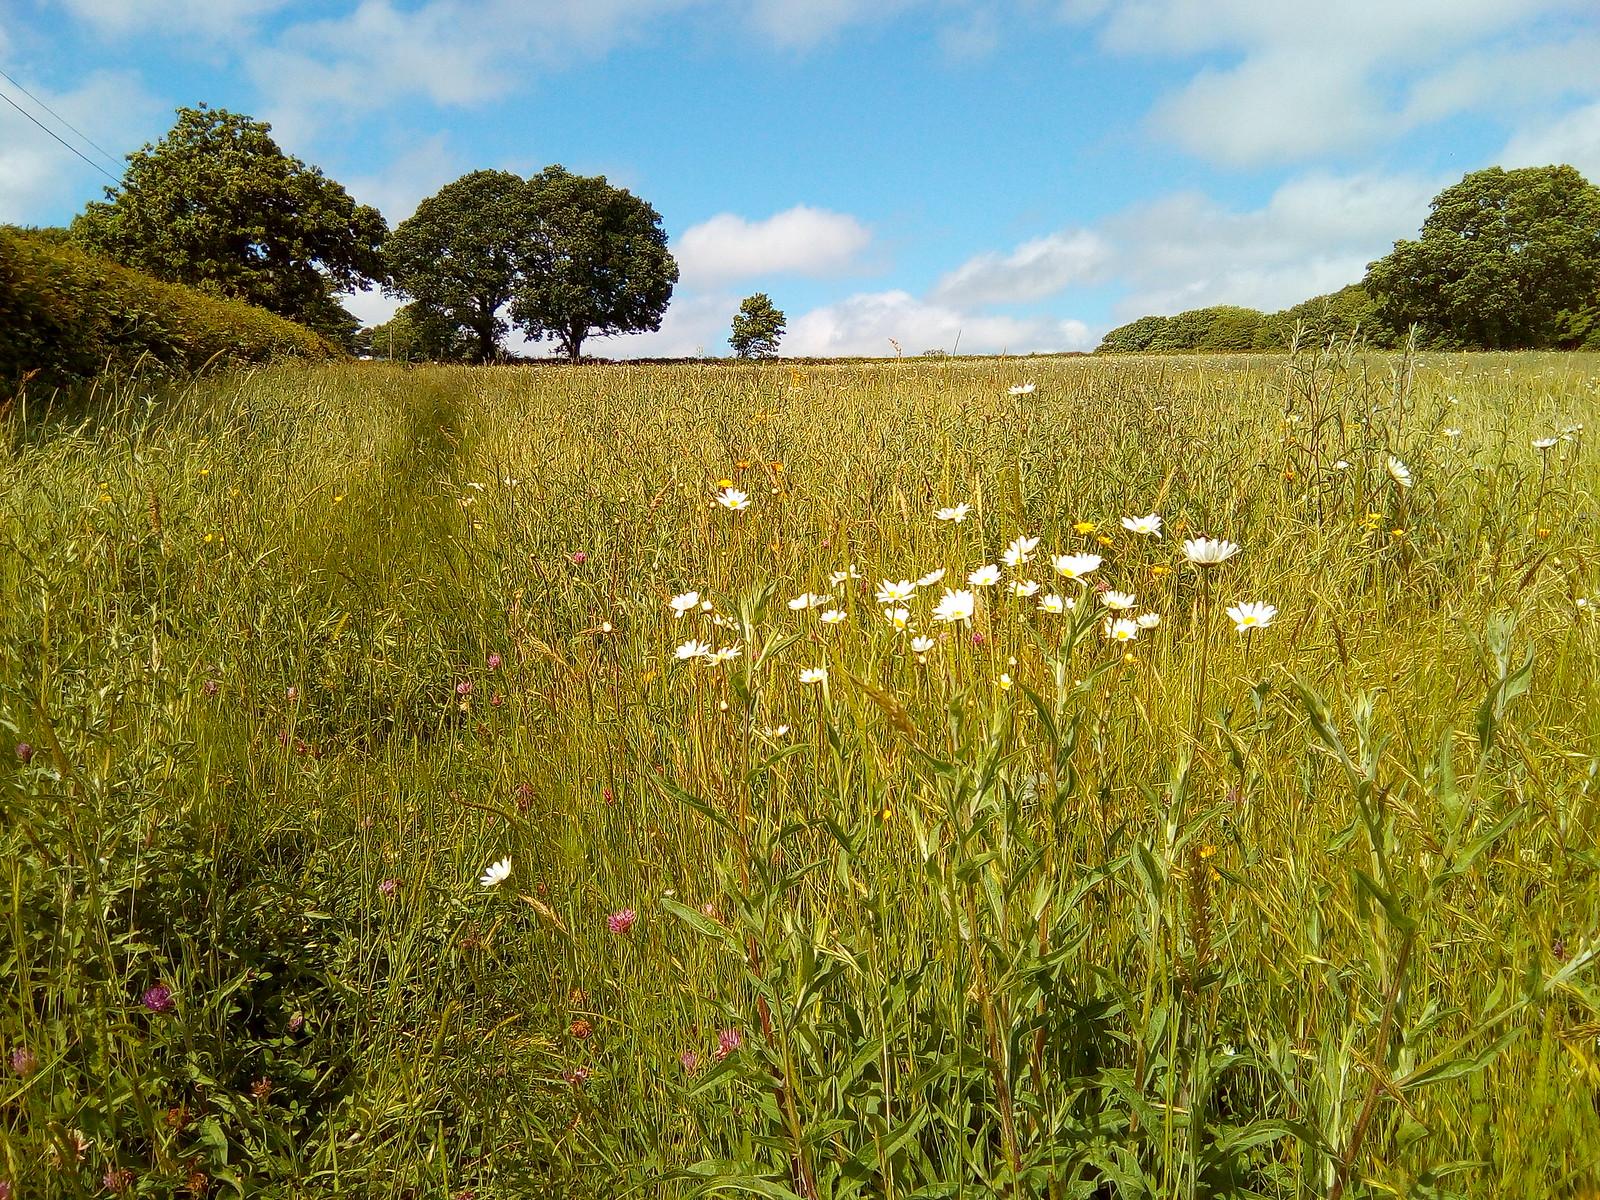 Oaks and Oxeye daisies Apparently Leucanthemum vulgare for Latin aficionados